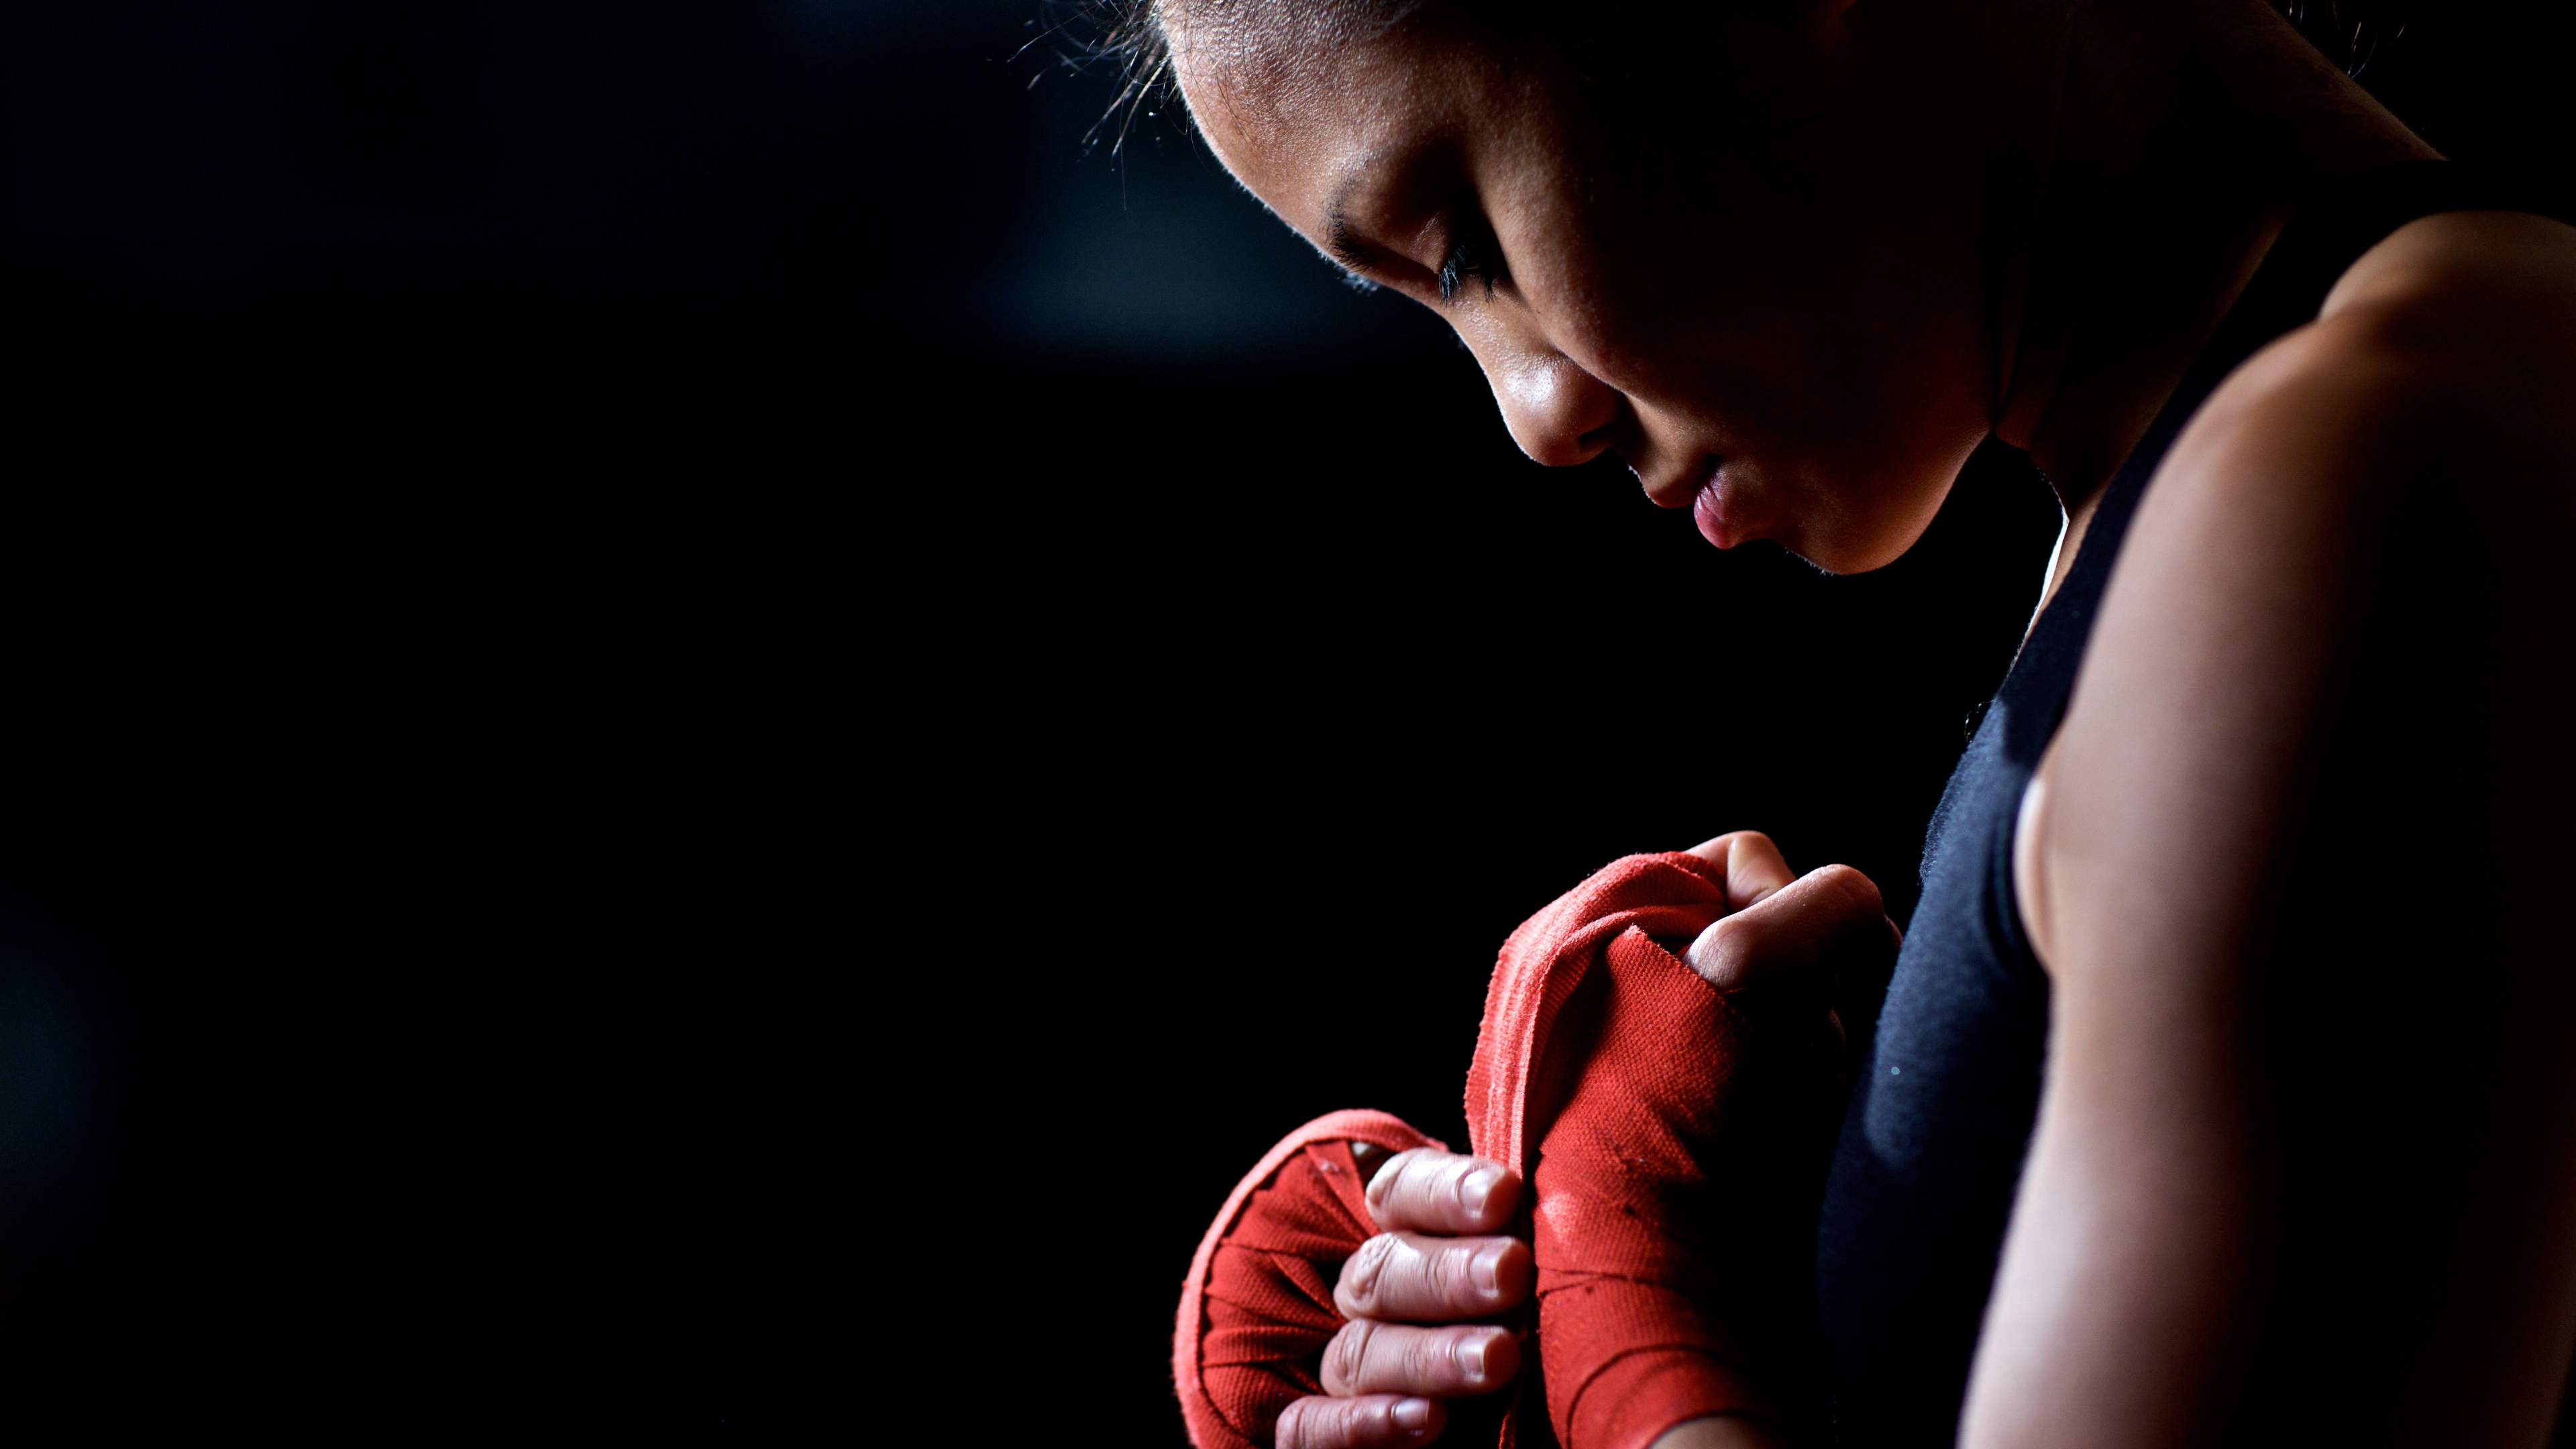 boxer champion girl bandages 4k 1540062566 - boxer, champion, girl, bandages 4k - Girl, champion, Boxer